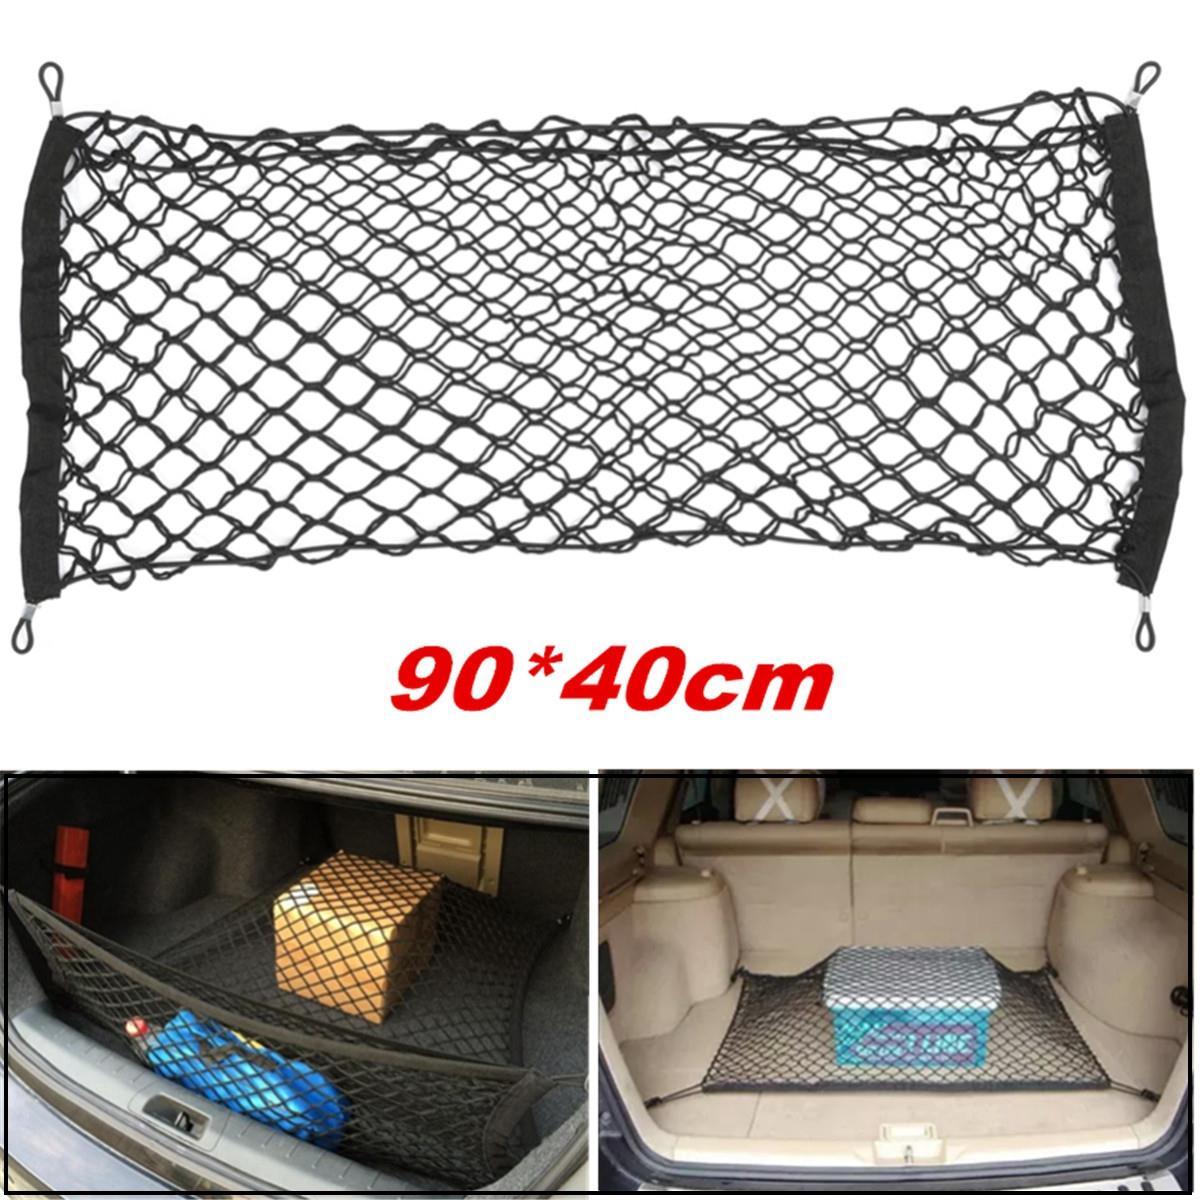 trunk car rear cargo organizer storage elastic carrier mesh net nylon 90x40cm car interior. Black Bedroom Furniture Sets. Home Design Ideas